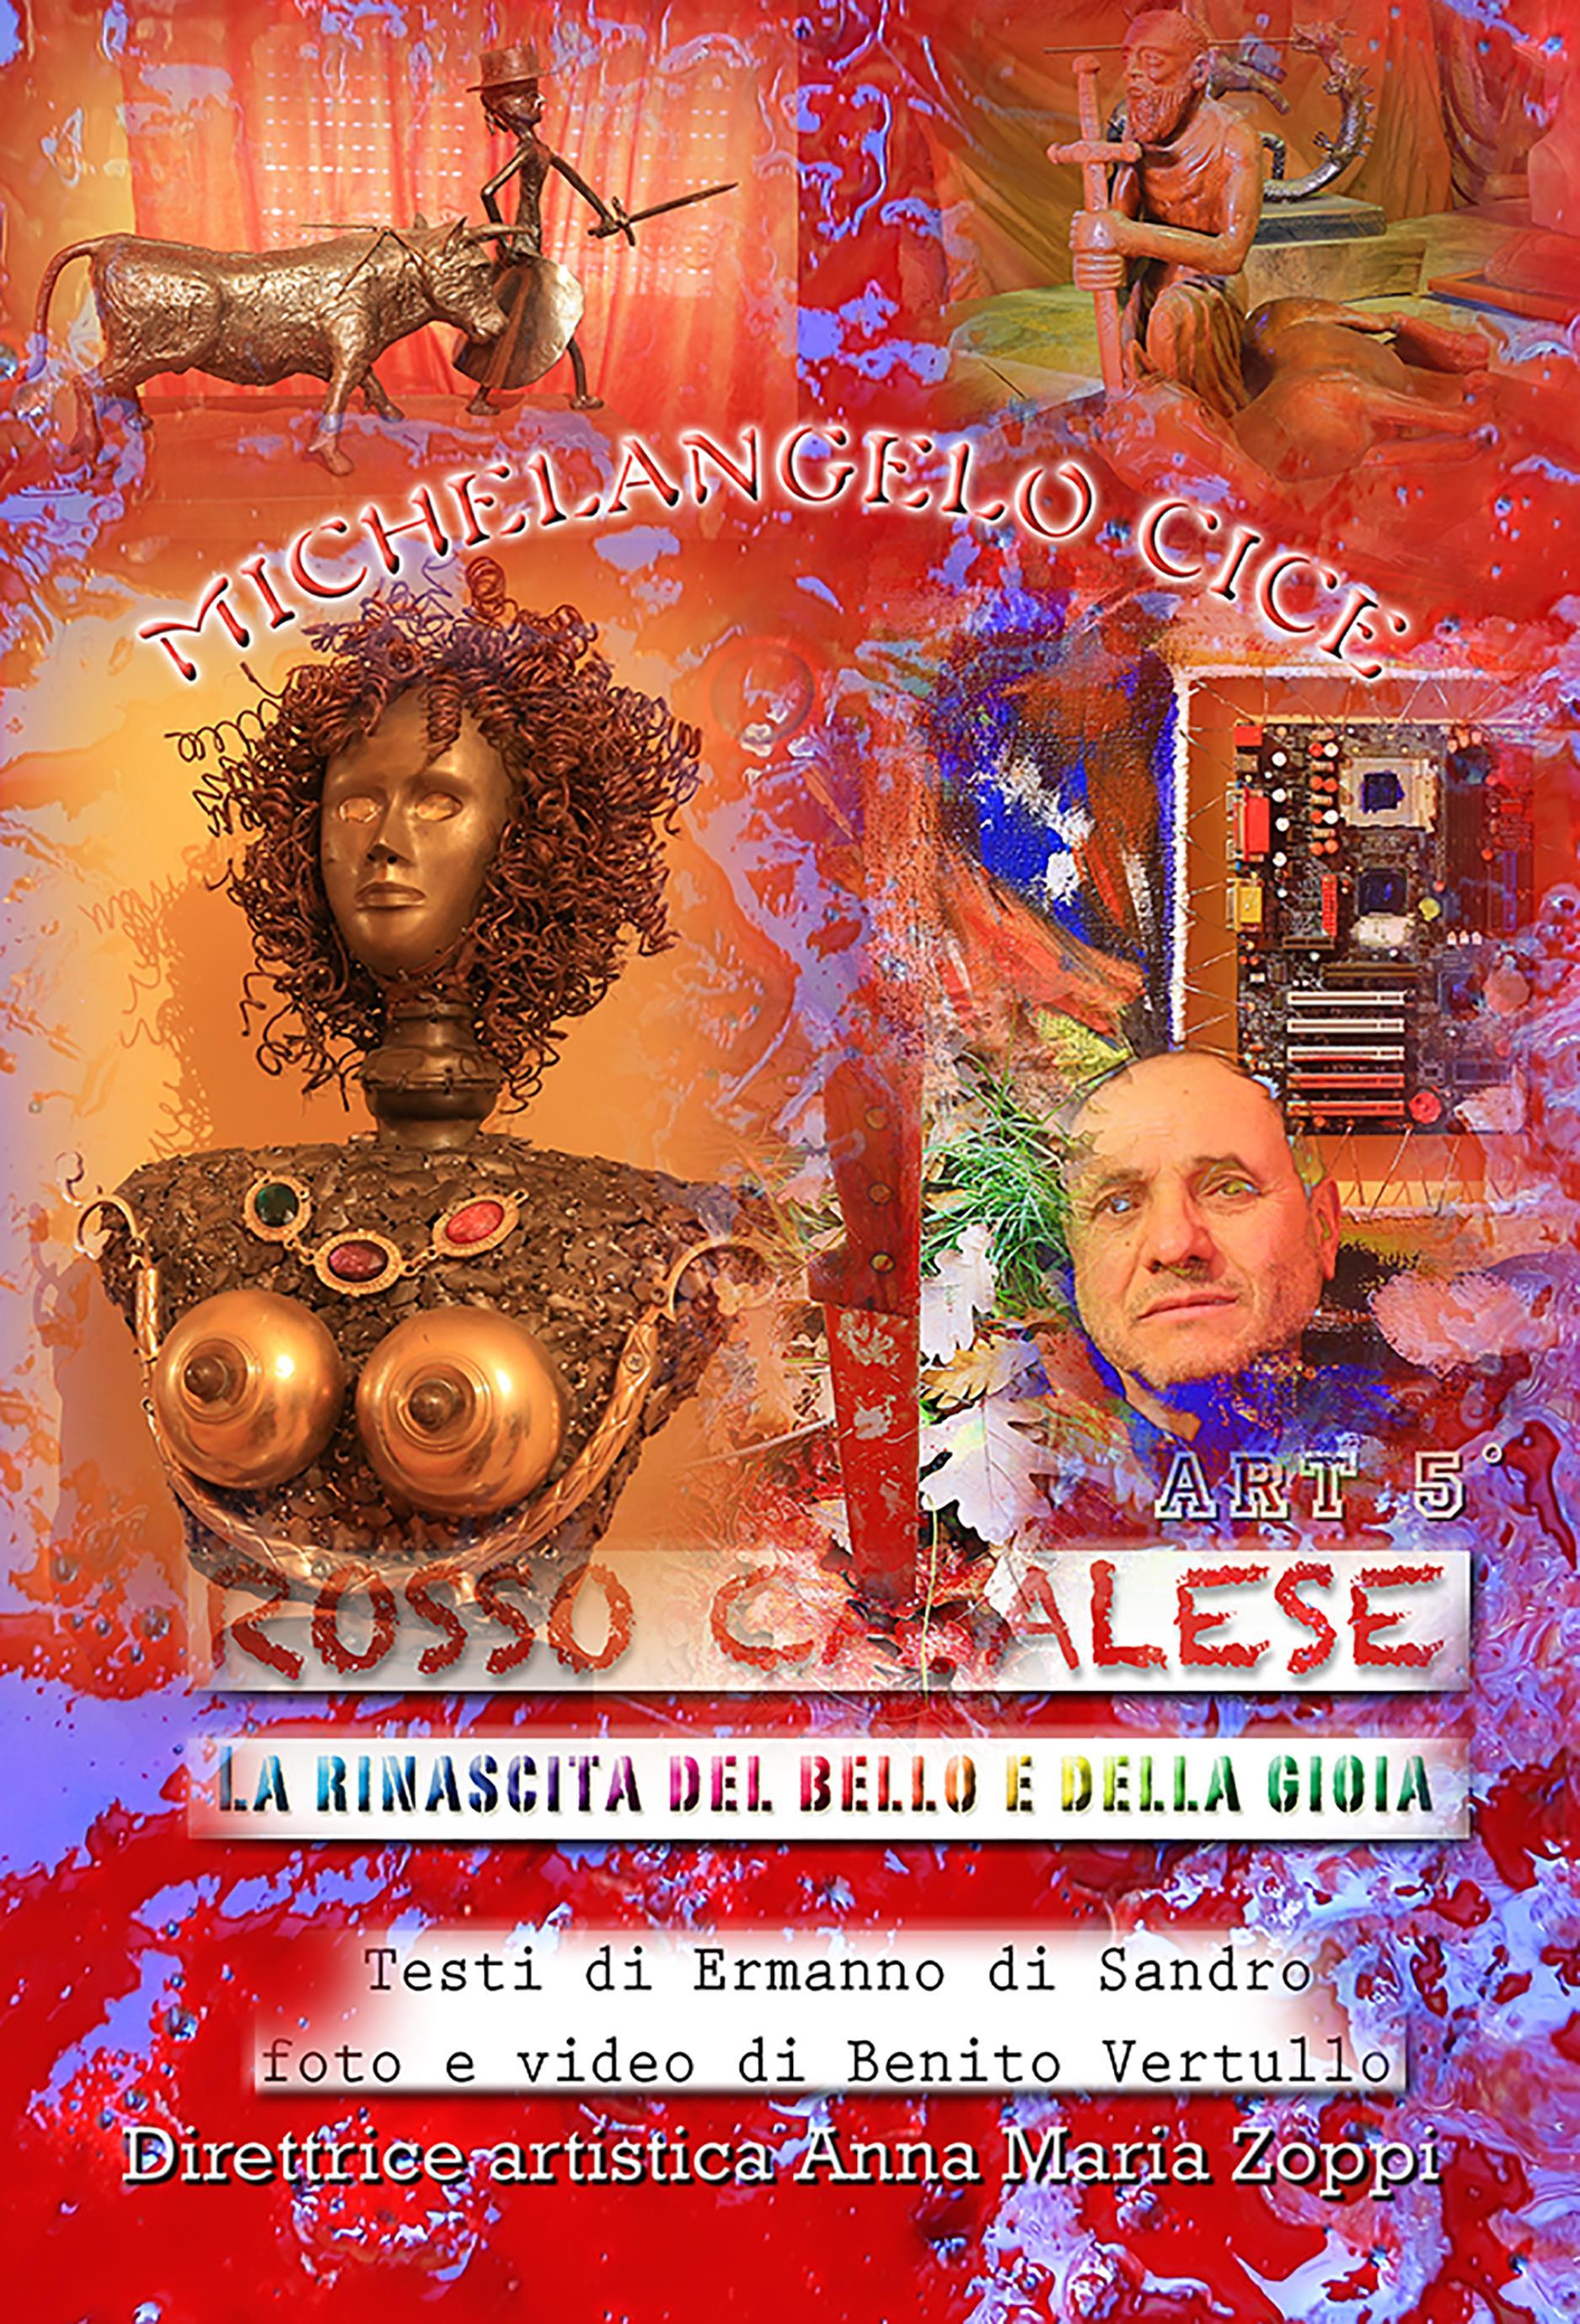 Rosso Casalese Art 5° Michelangelo Cice